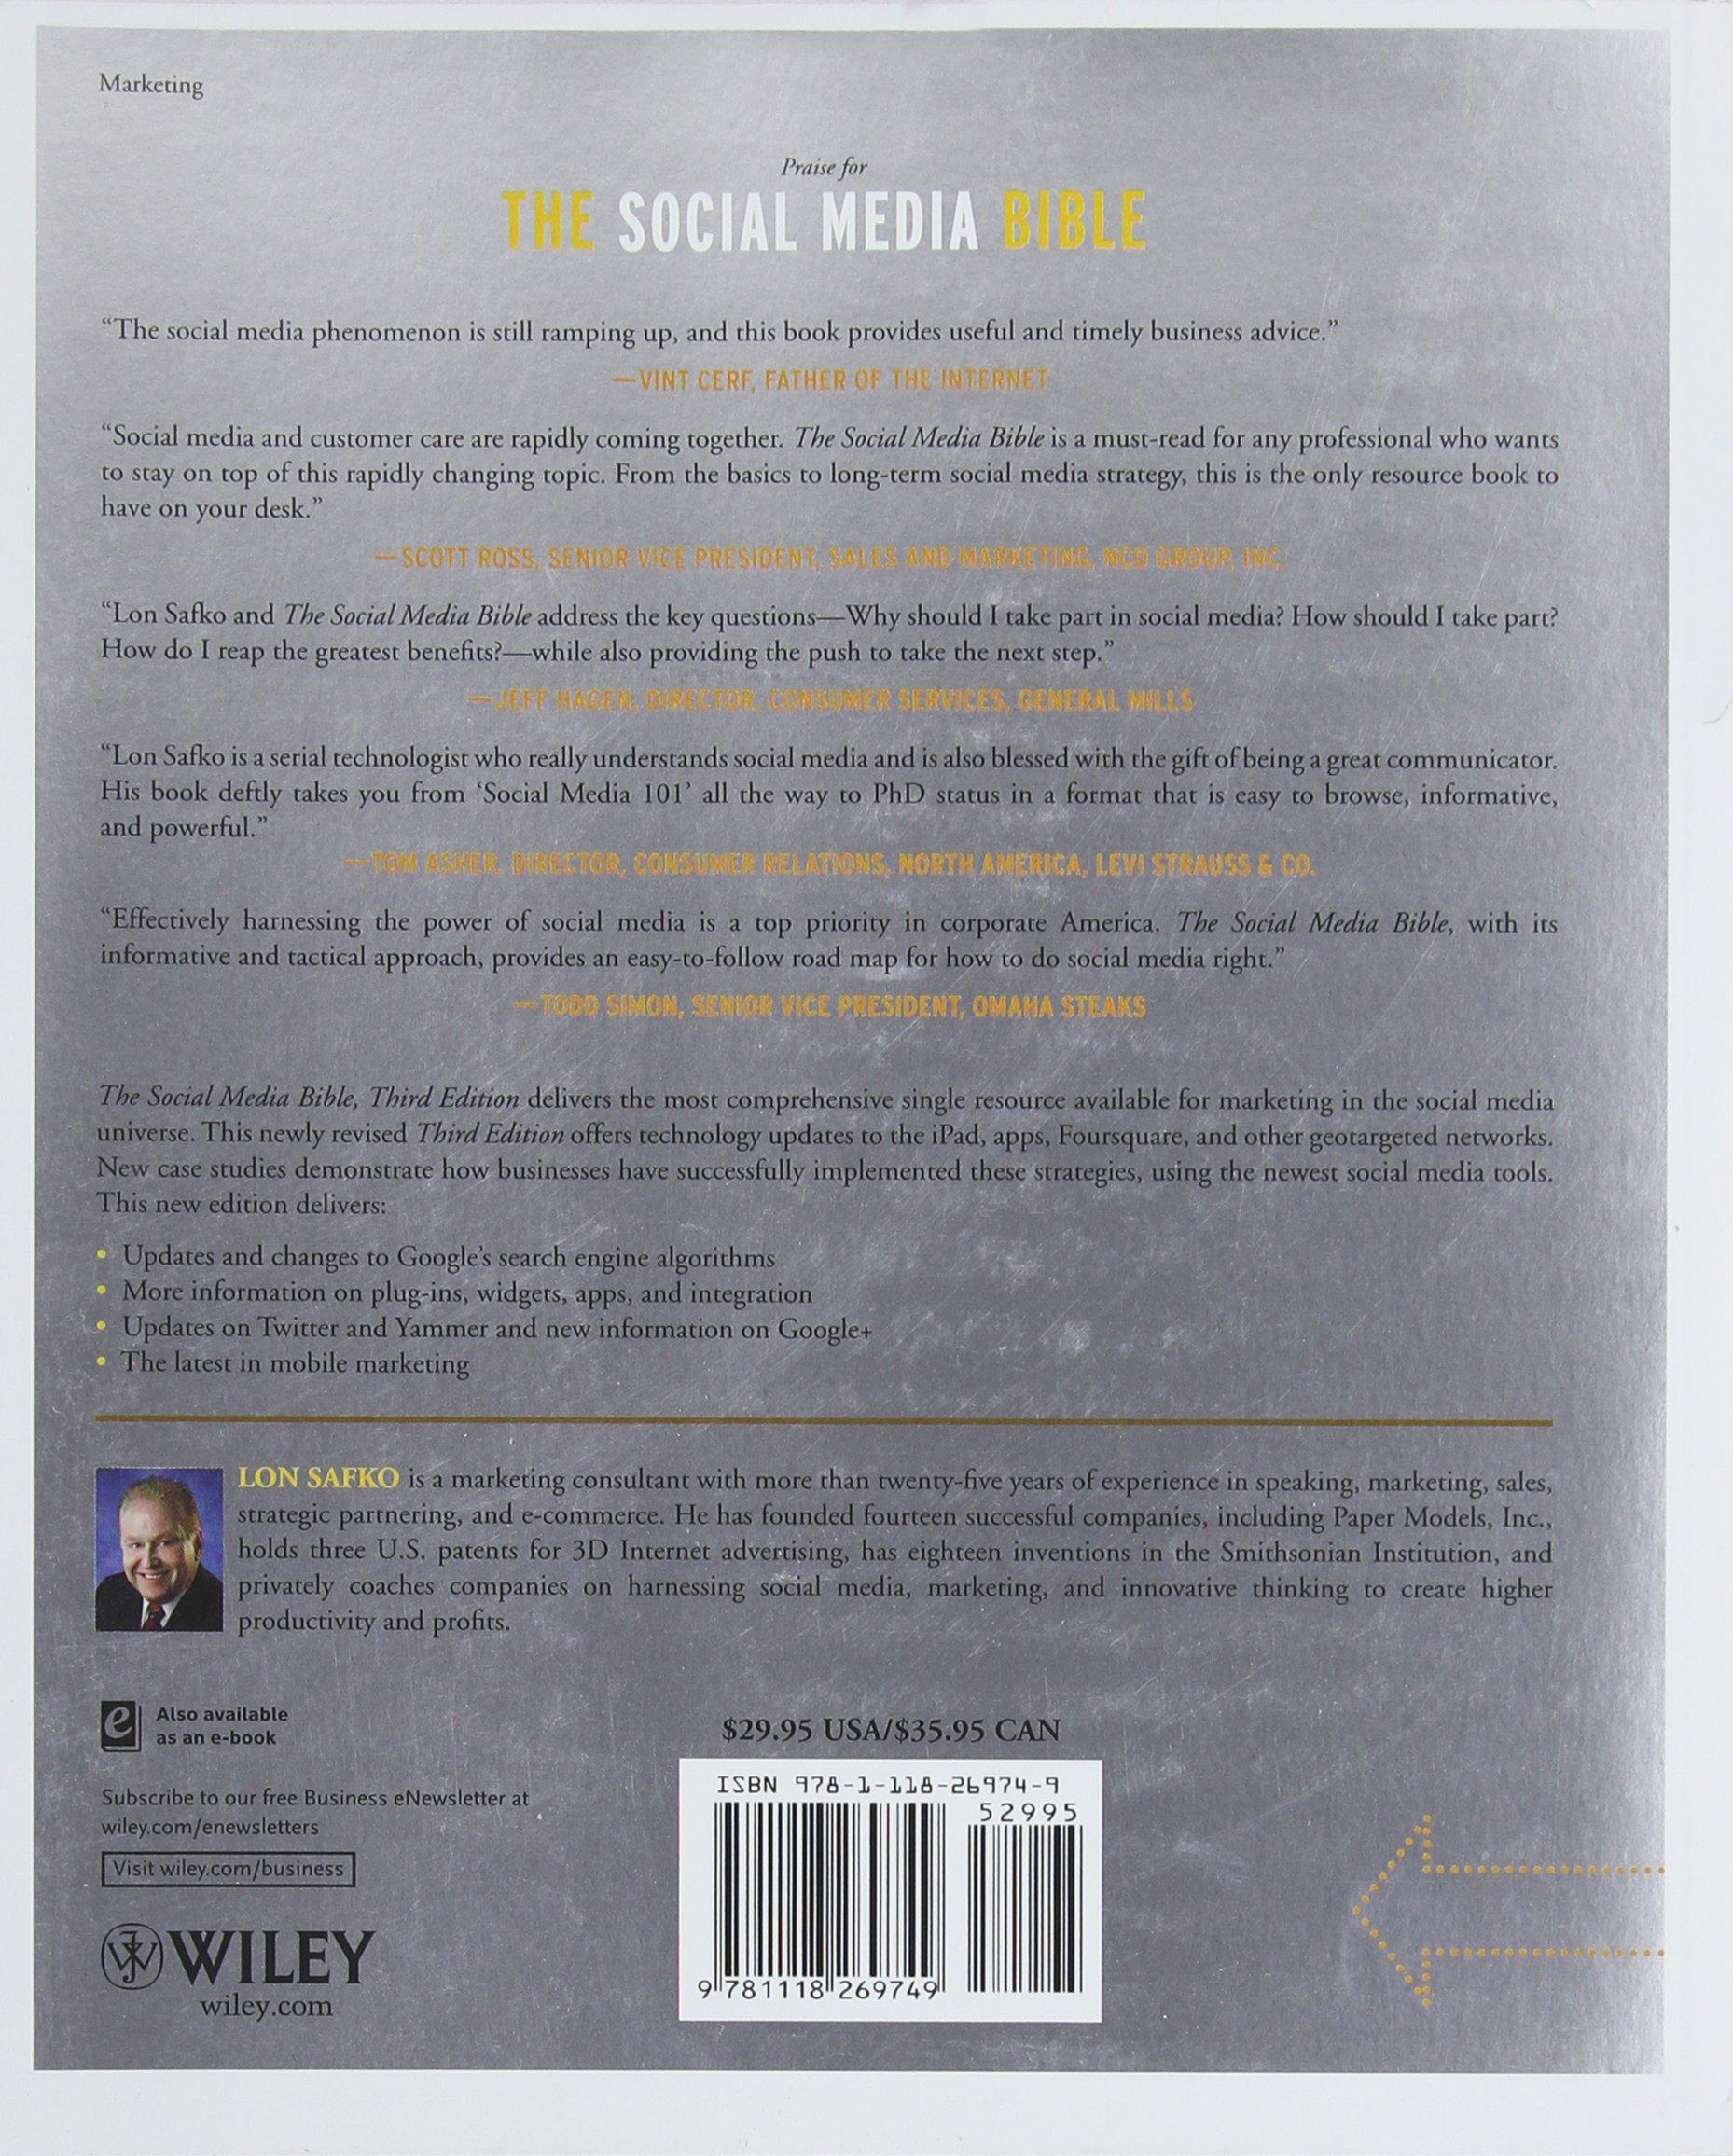 The Social Media Bible: Tactics, Tools, and Strategies for Business  Success: Lon Safko: 8601400125236: Amazon.com: Books